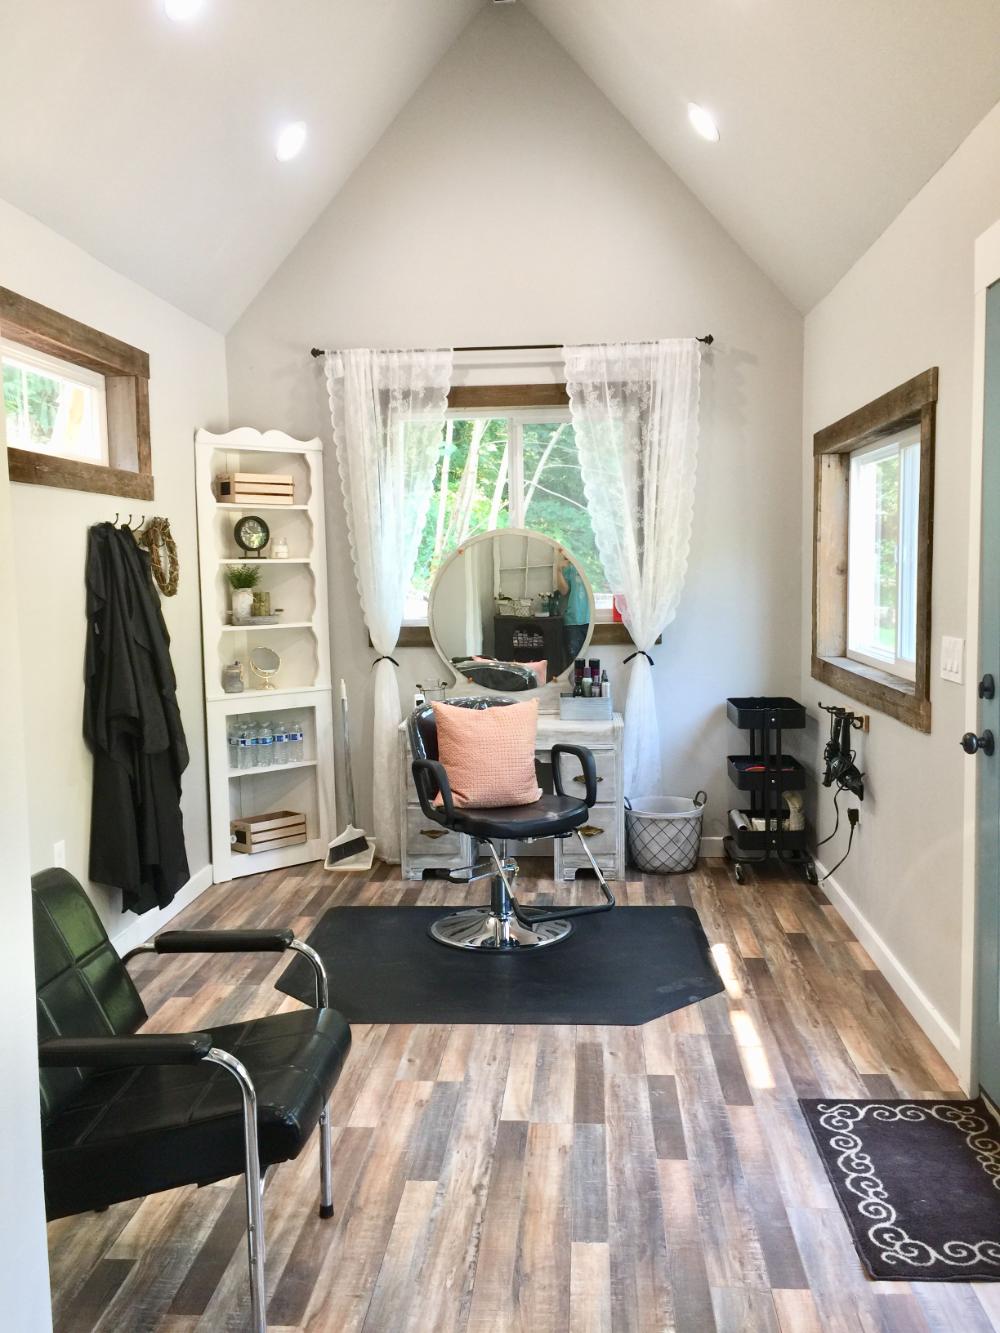 beauty salon in garden shed en 17  Diseño de salón de belleza